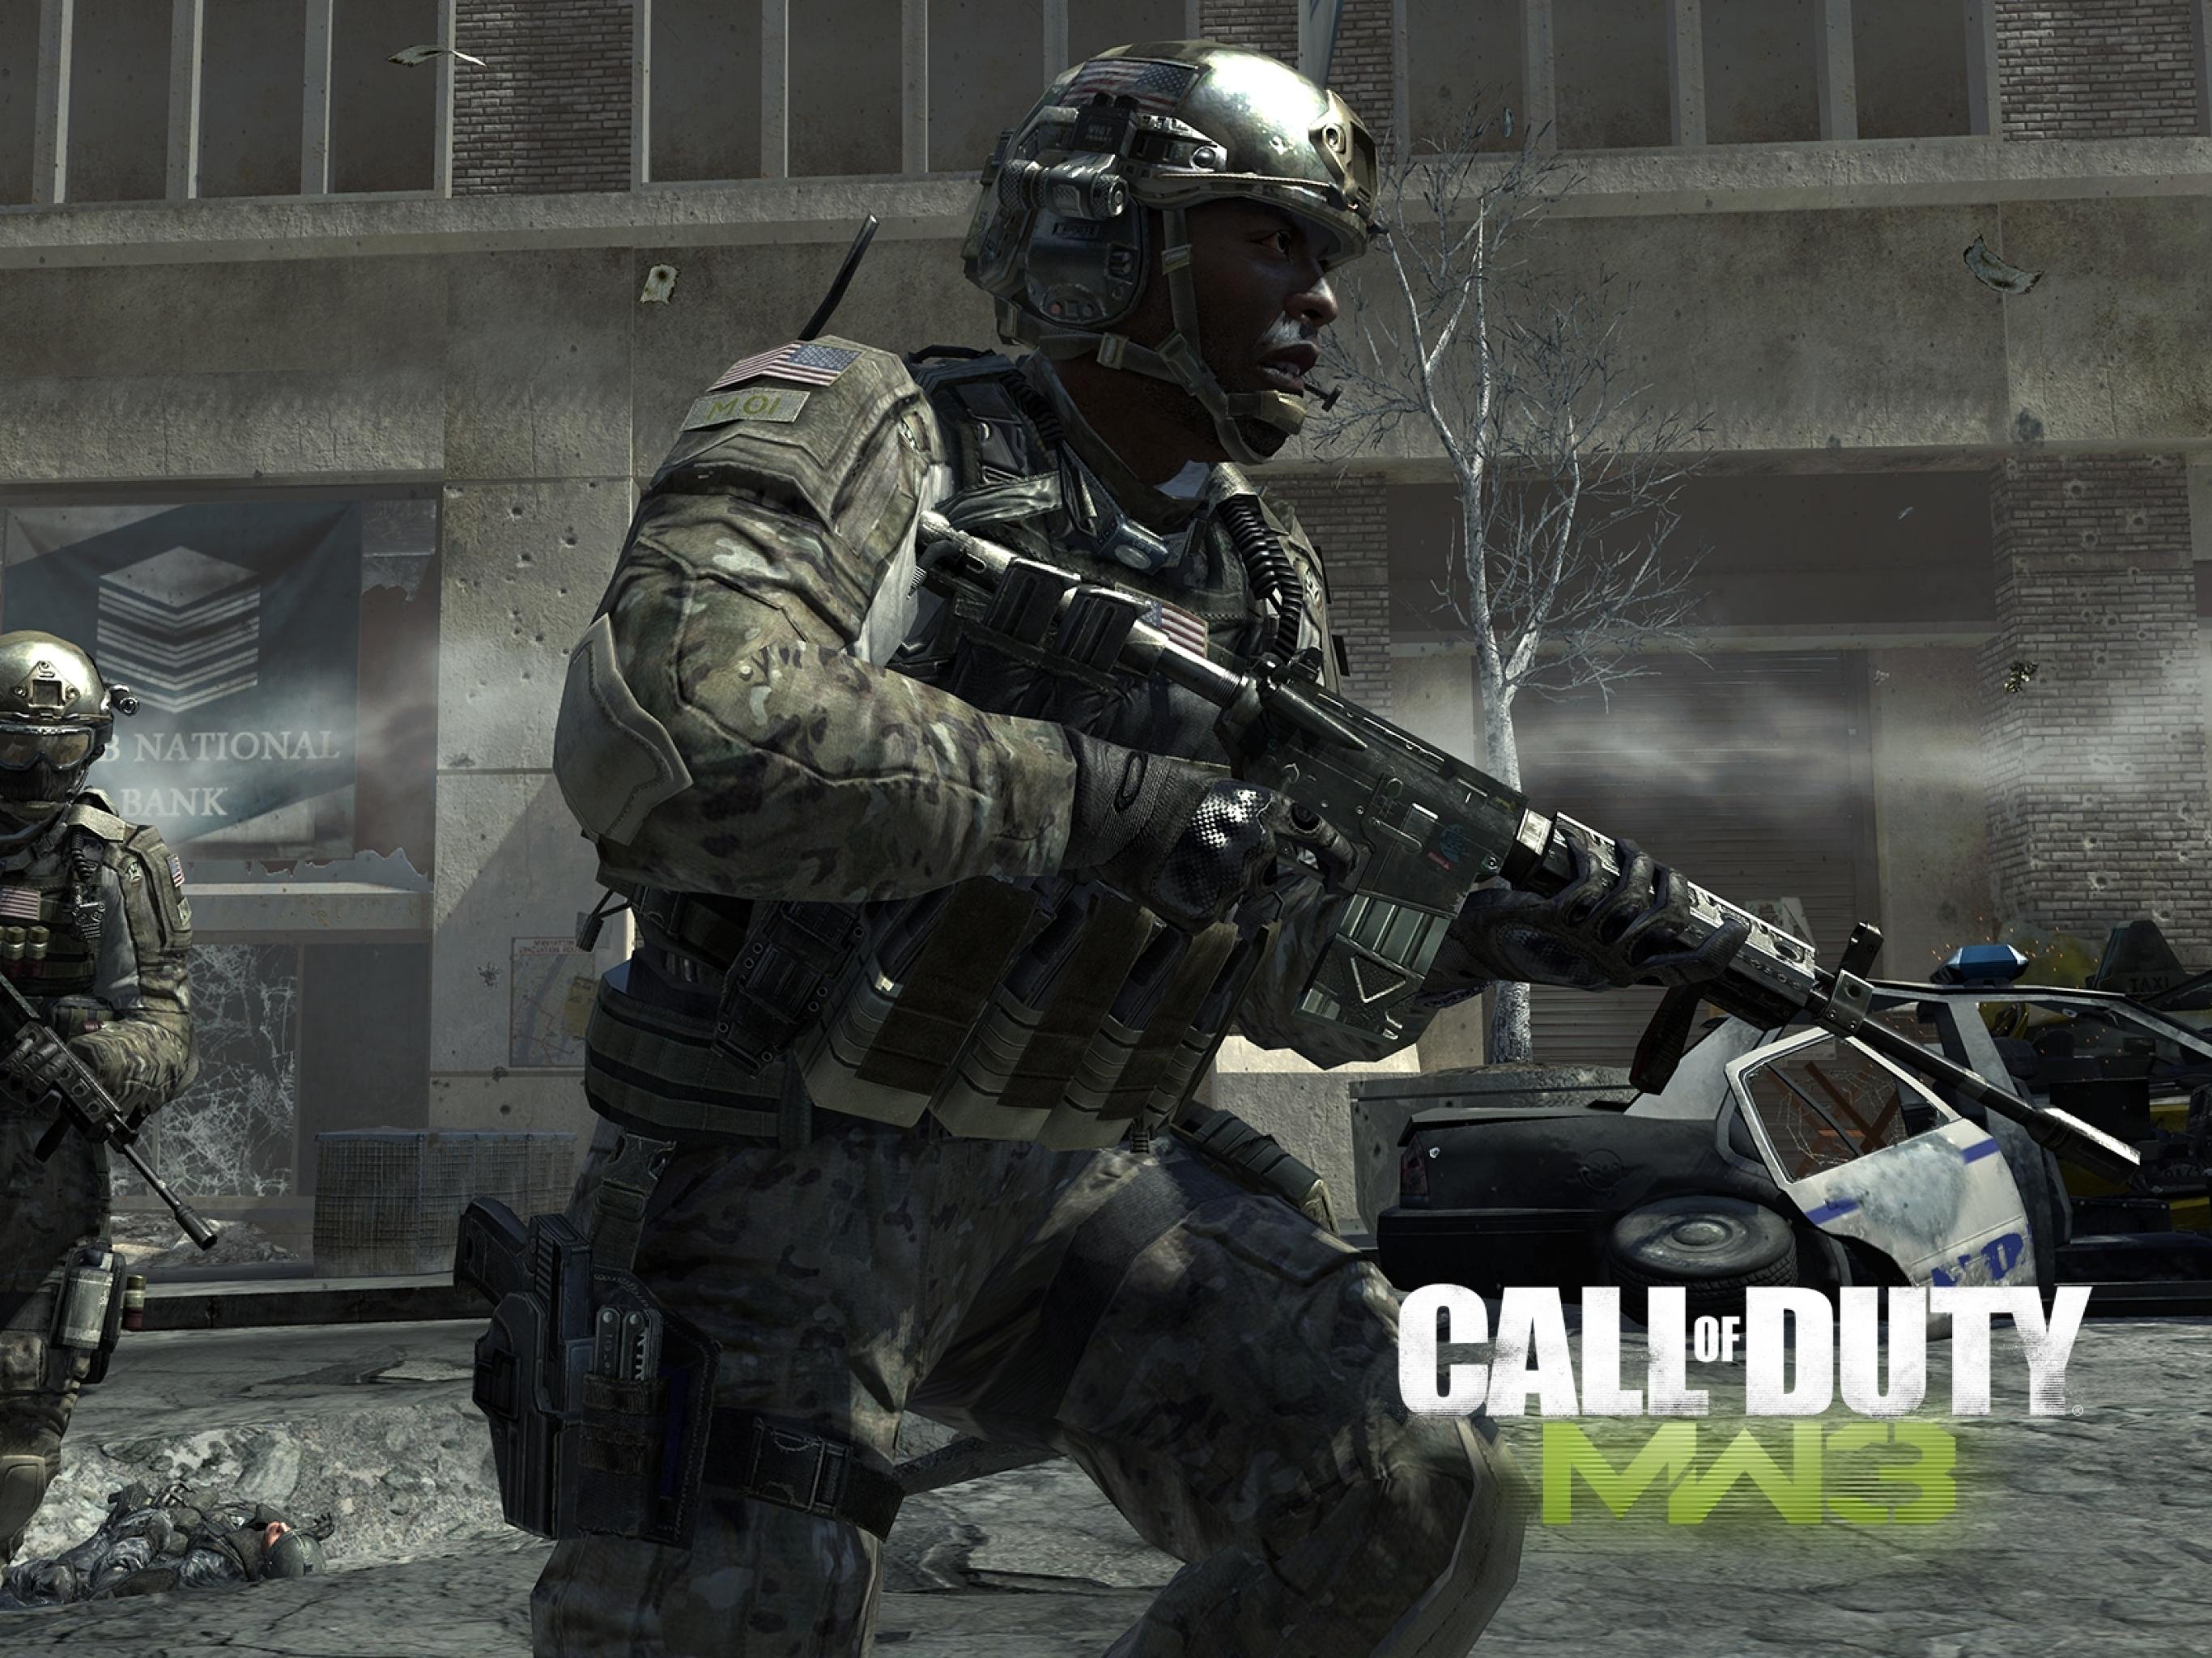 2732x2048 Call Of Duty Modern Warfare 3 Soldiers Bank Machines